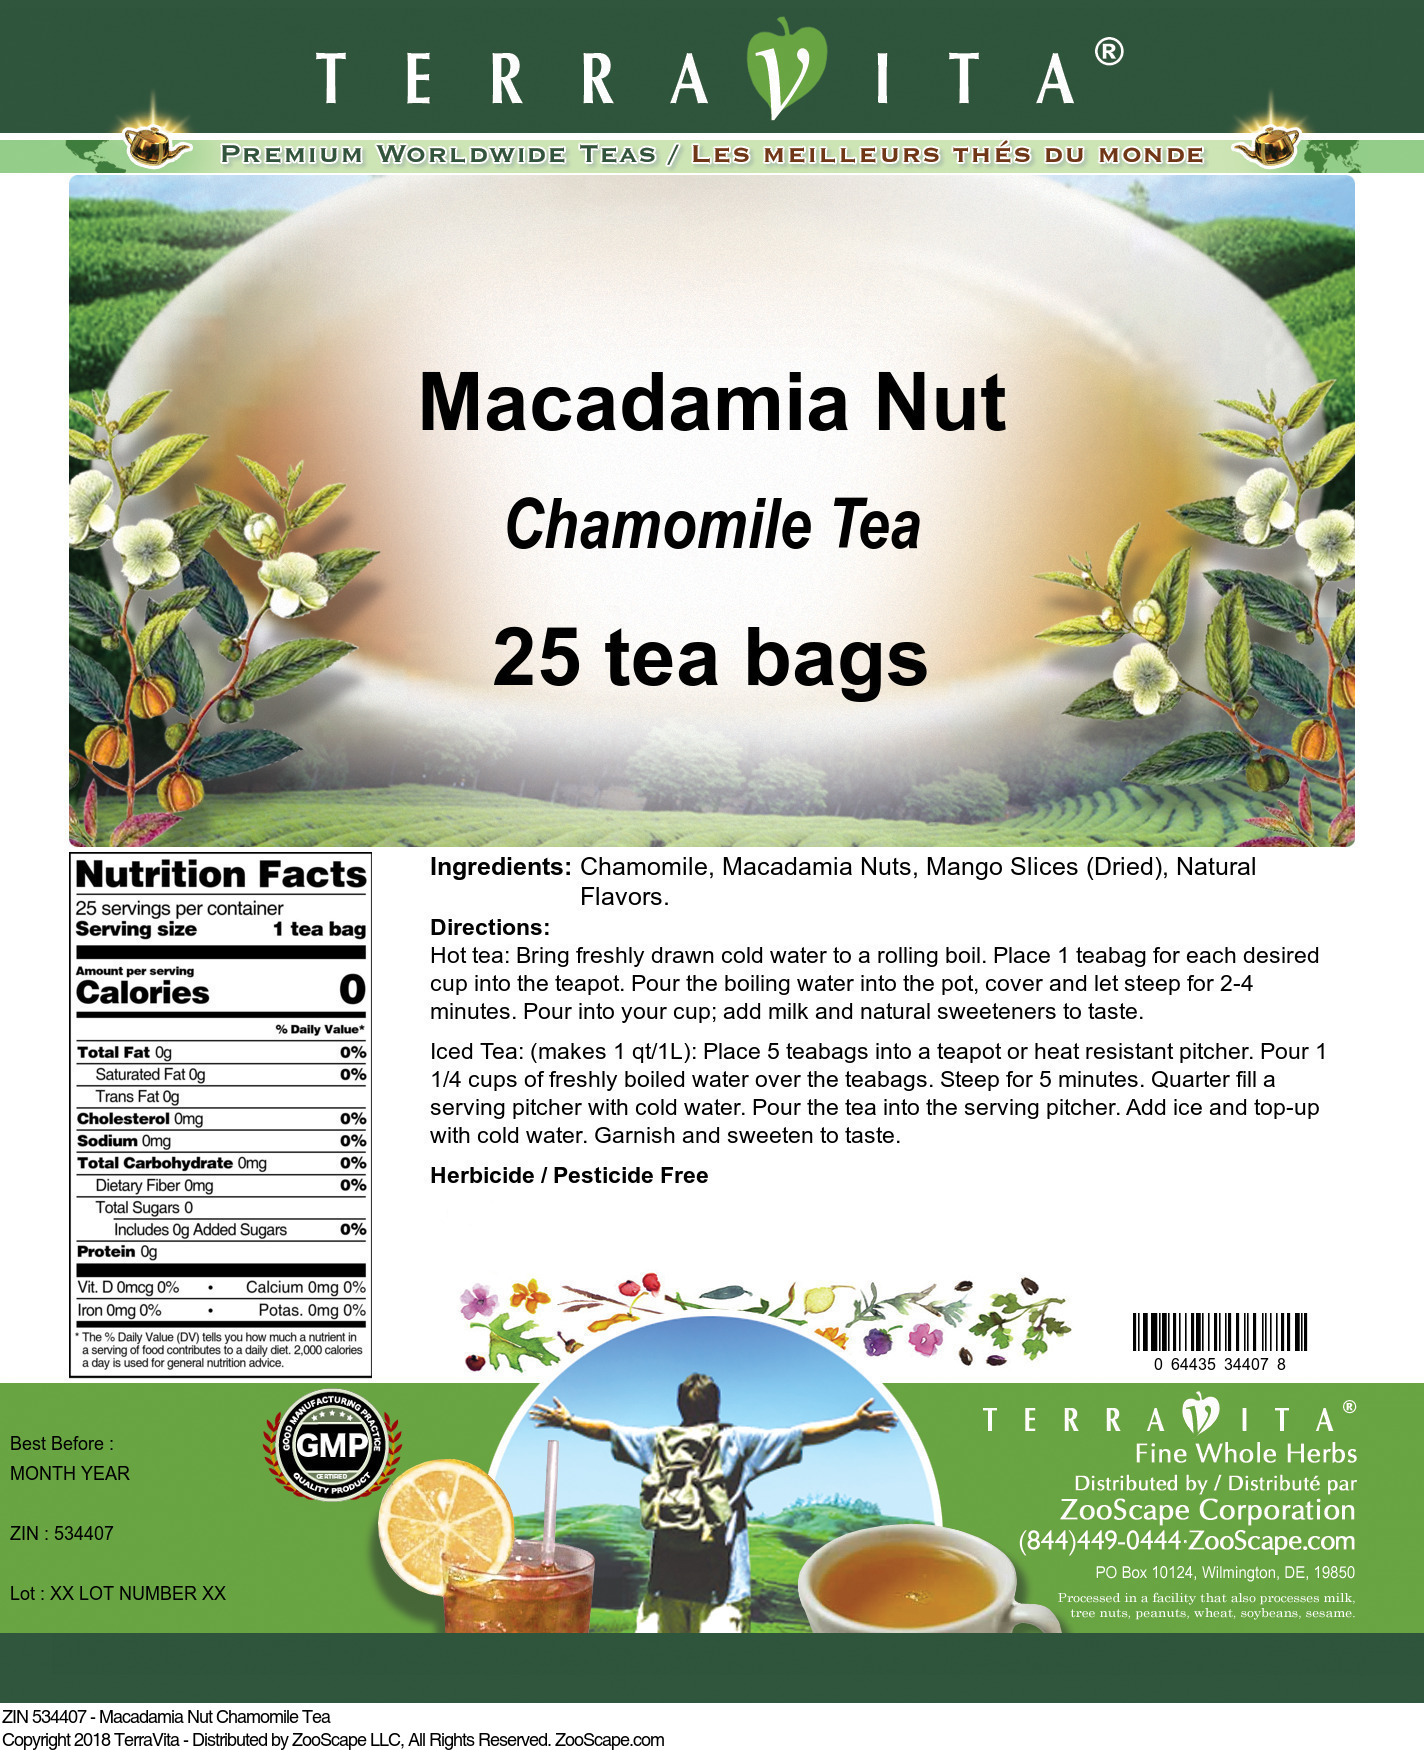 Macadamia Nut Chamomile Tea